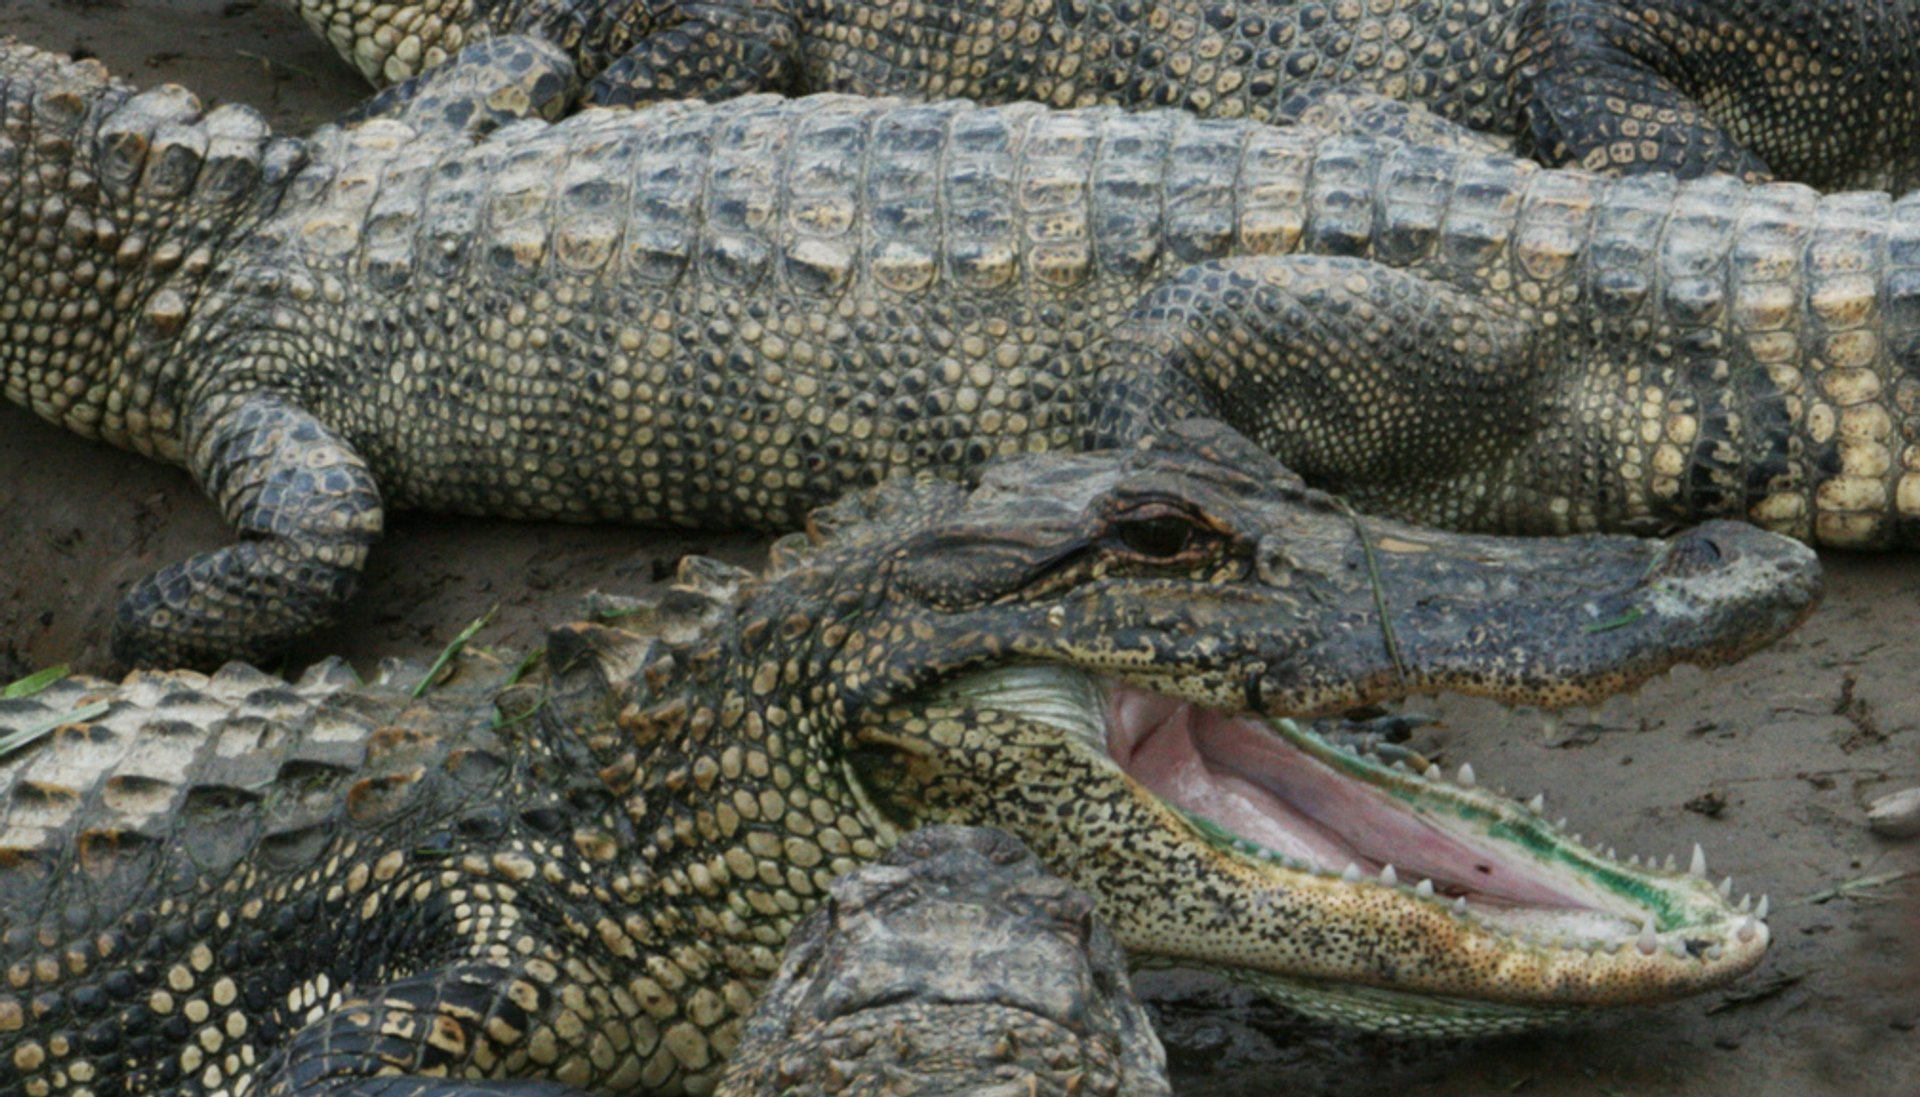 Alligators in Texas 2020 - Best Time